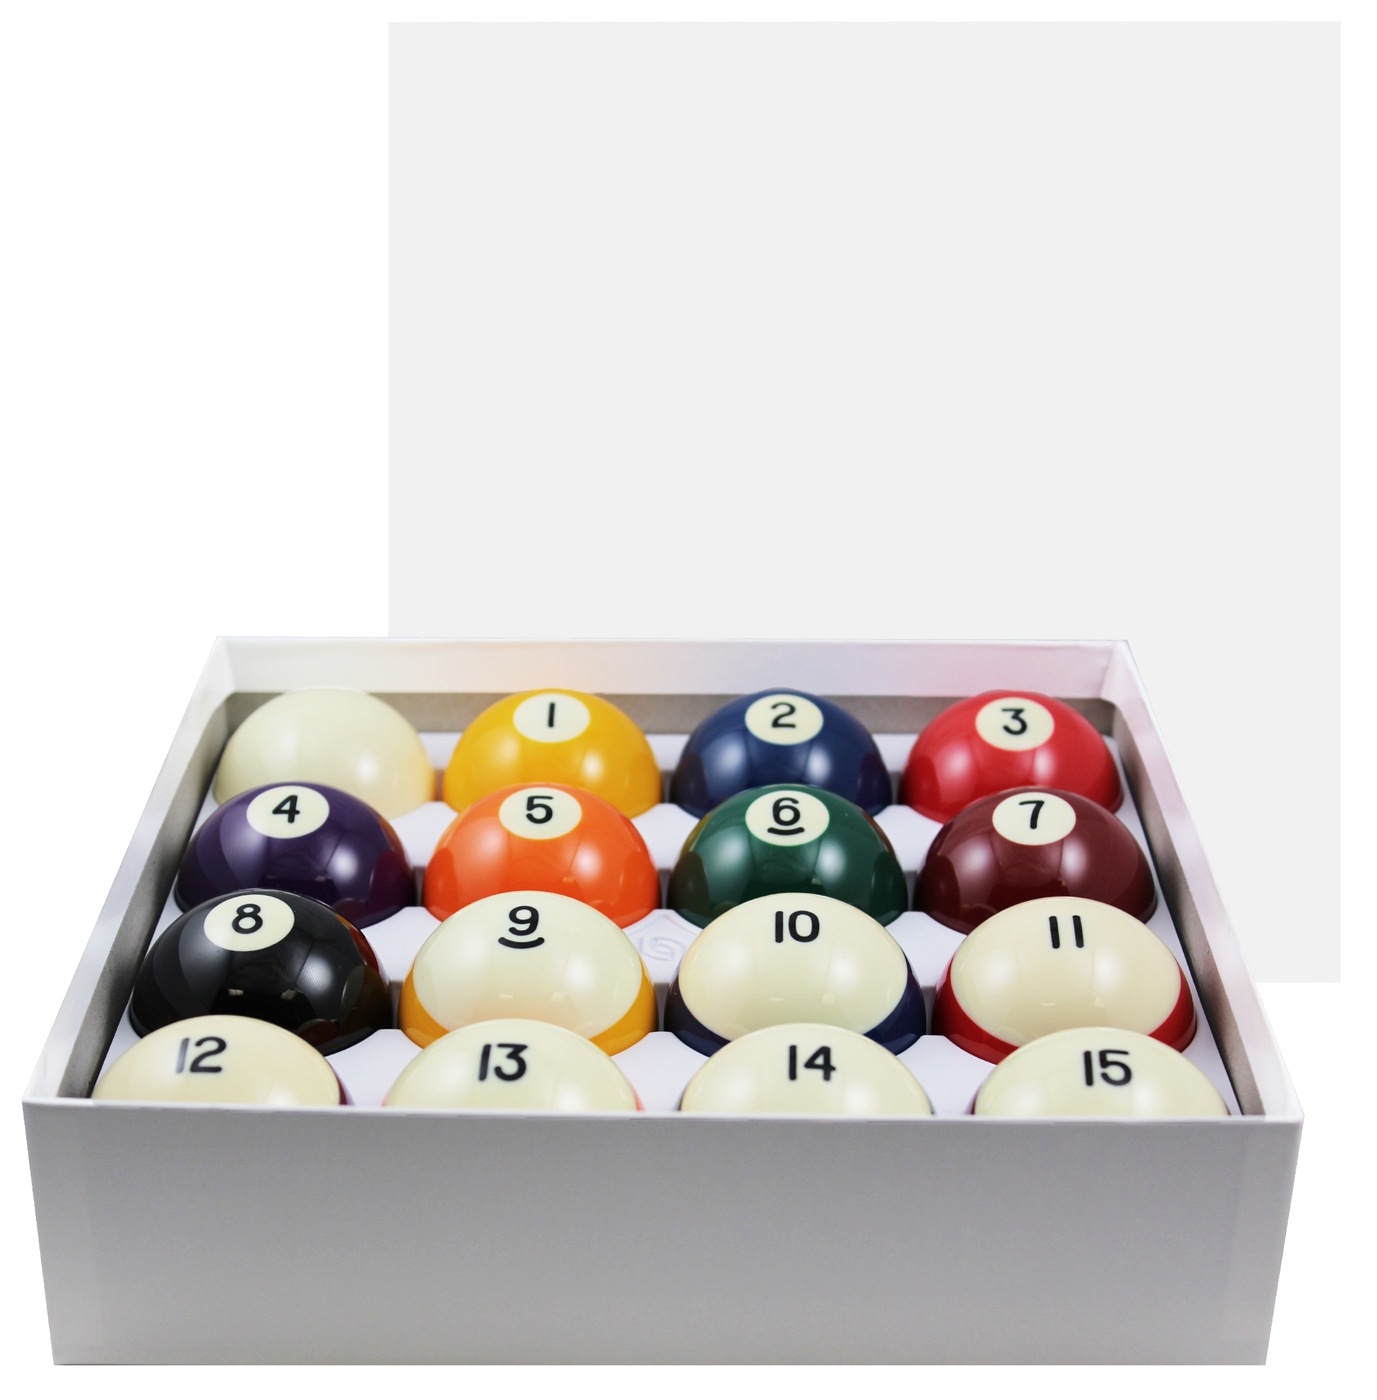 24 Pool Billiard Stick on BLACK Ball Marker Spots Self Adhesive Regulation Size